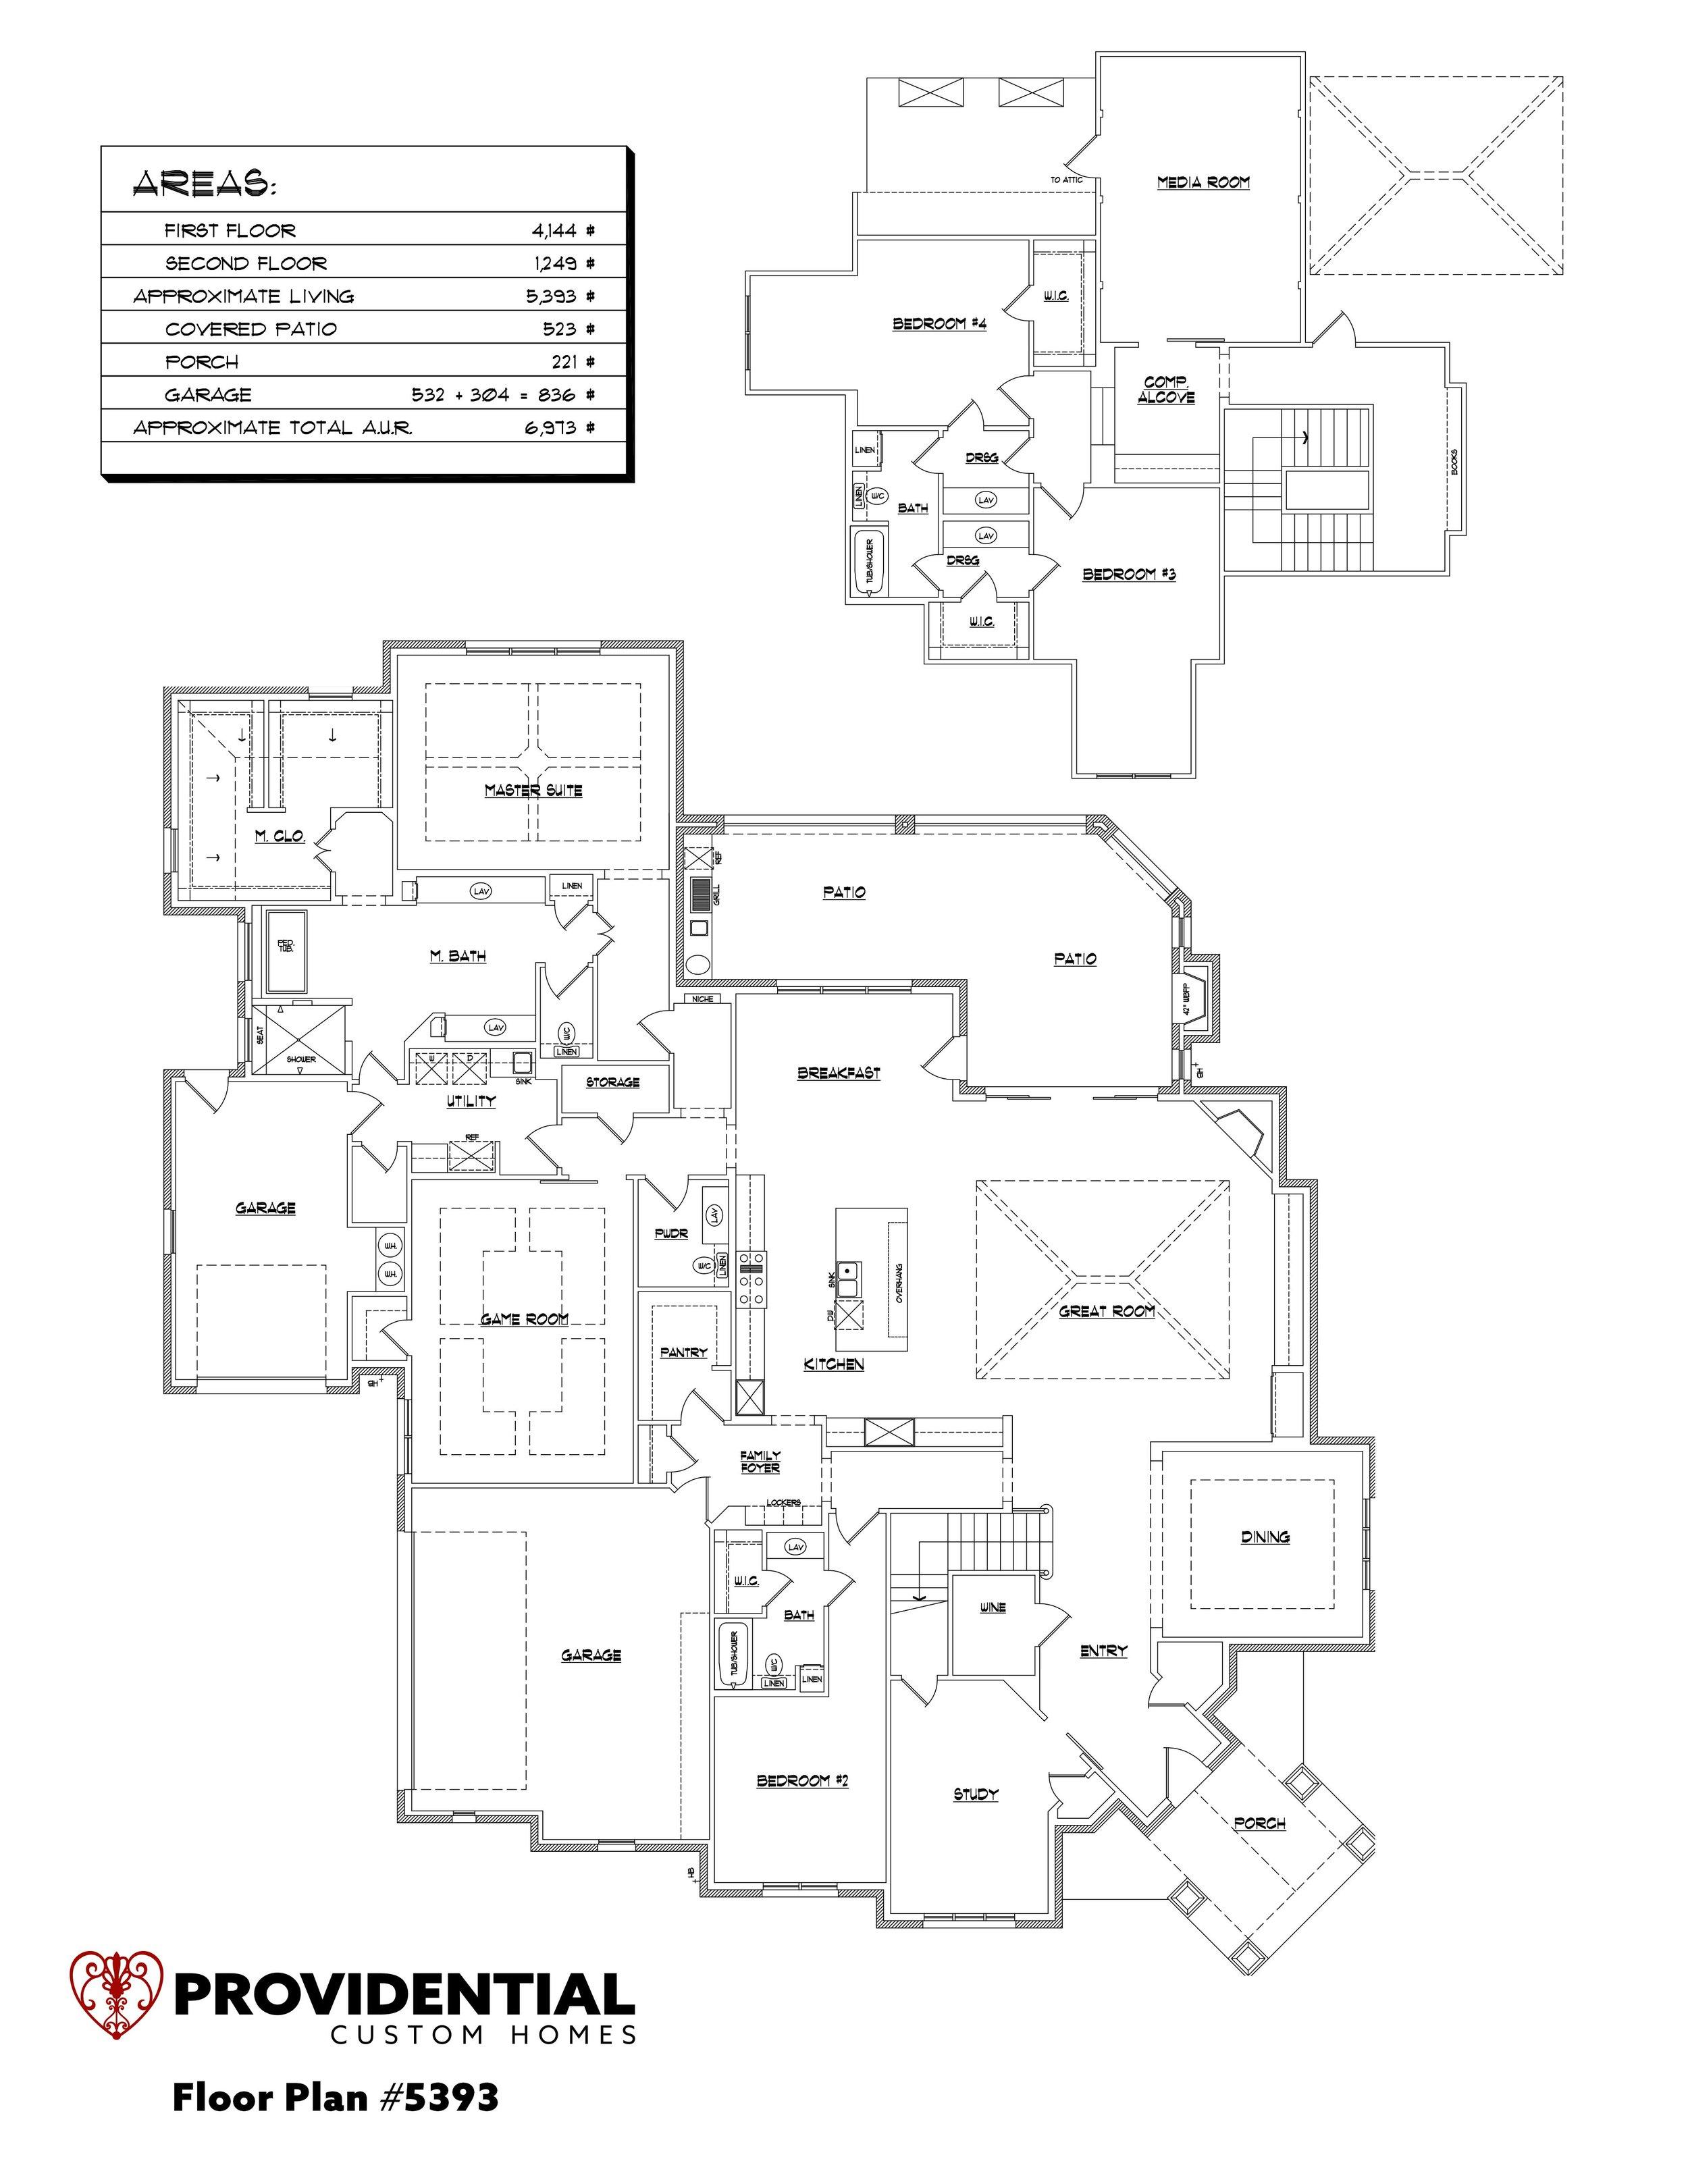 The FLOOR PLAN #5393.jpg